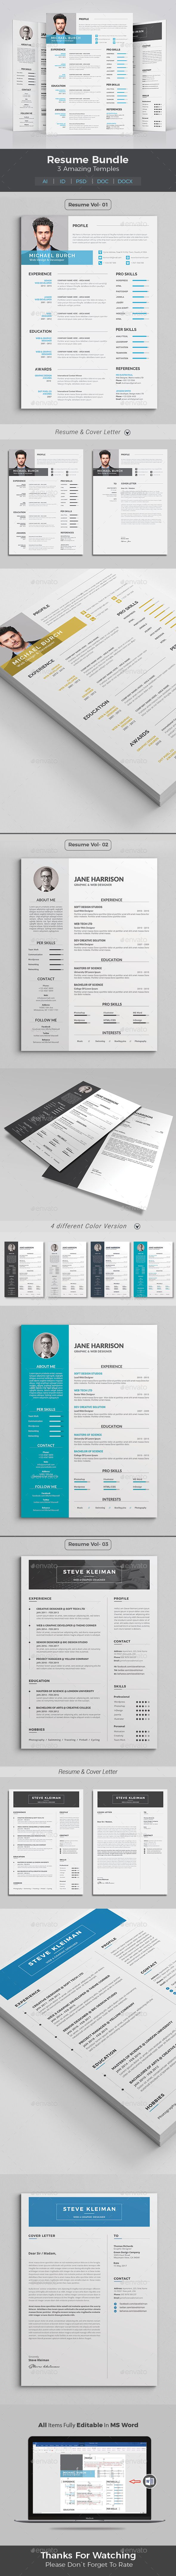 Resume Word #Bundle - Resumes Stationery | Resume template ...